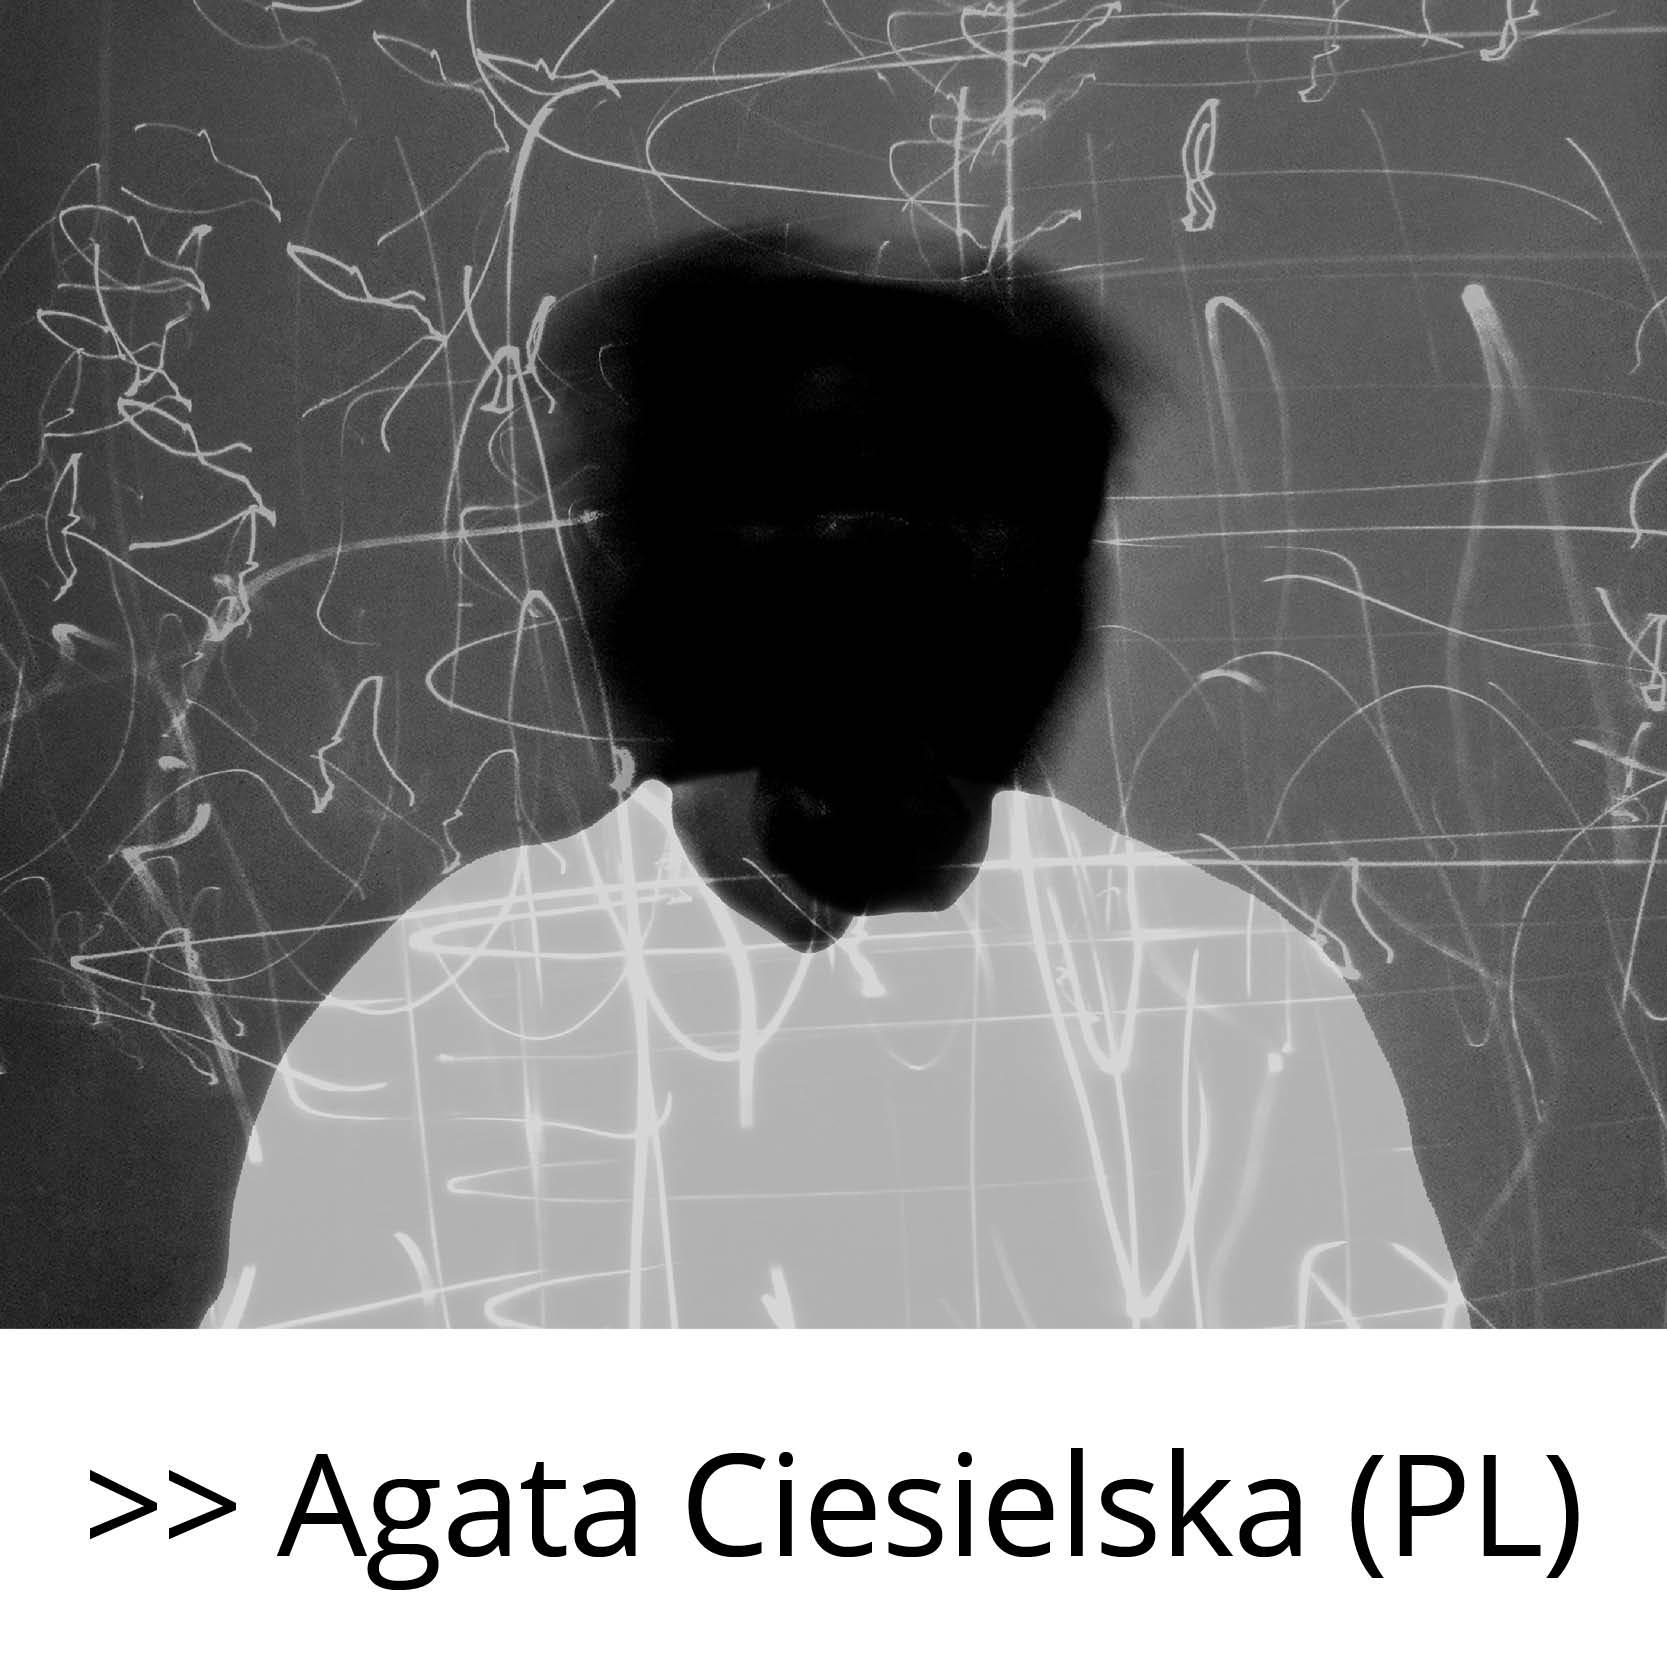 Agata_Ciesielska_(PL)